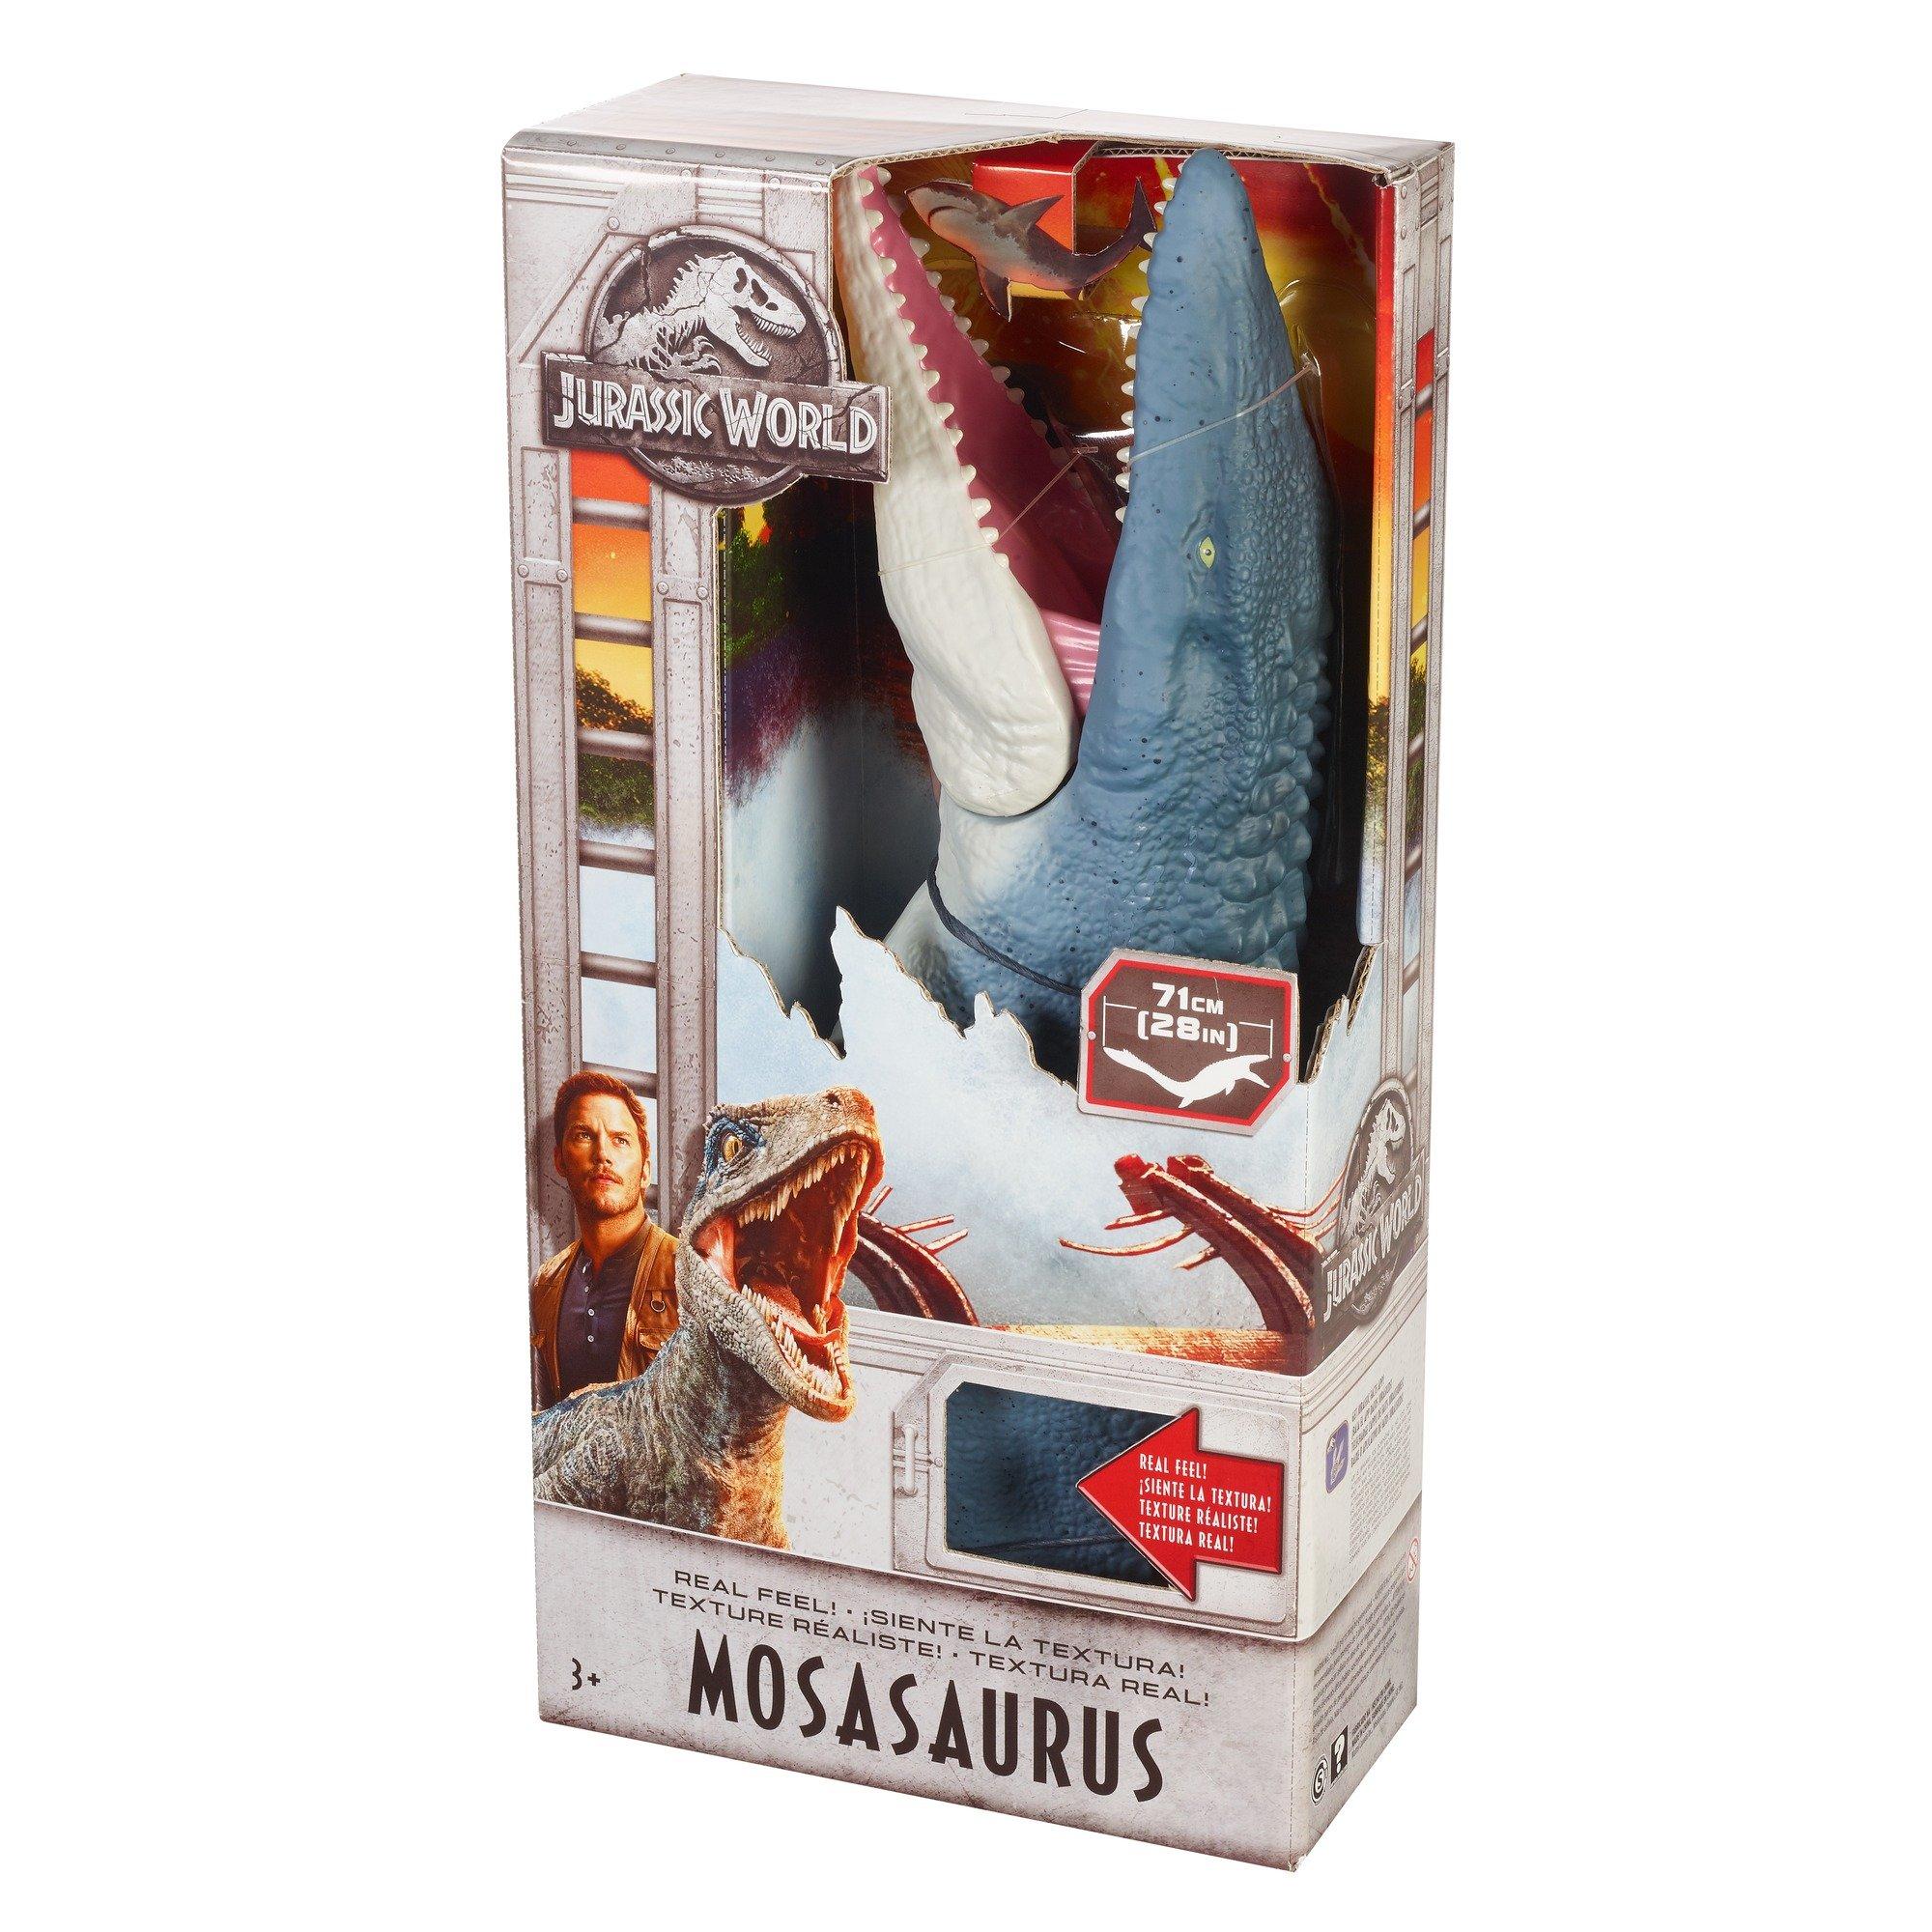 Jurassic World Real Feel Mosasaurus Figure by Jurassic World Toys (Image #6)